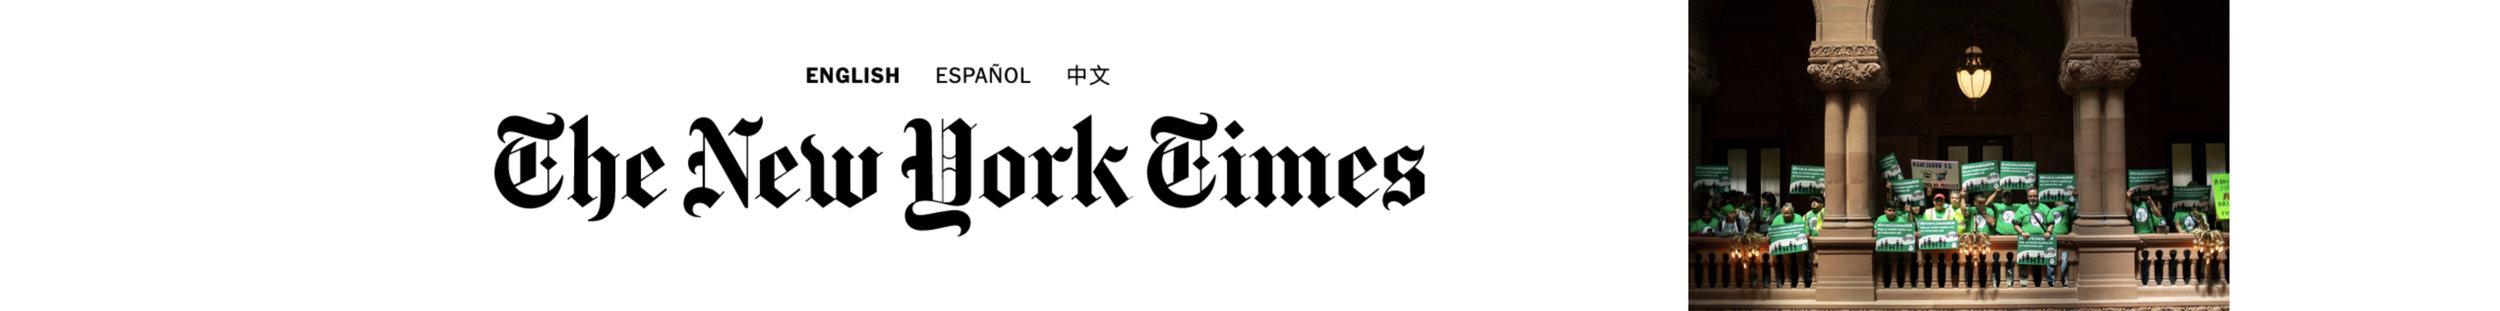 OLA NYT 06.17.2019 V. copy.jpg